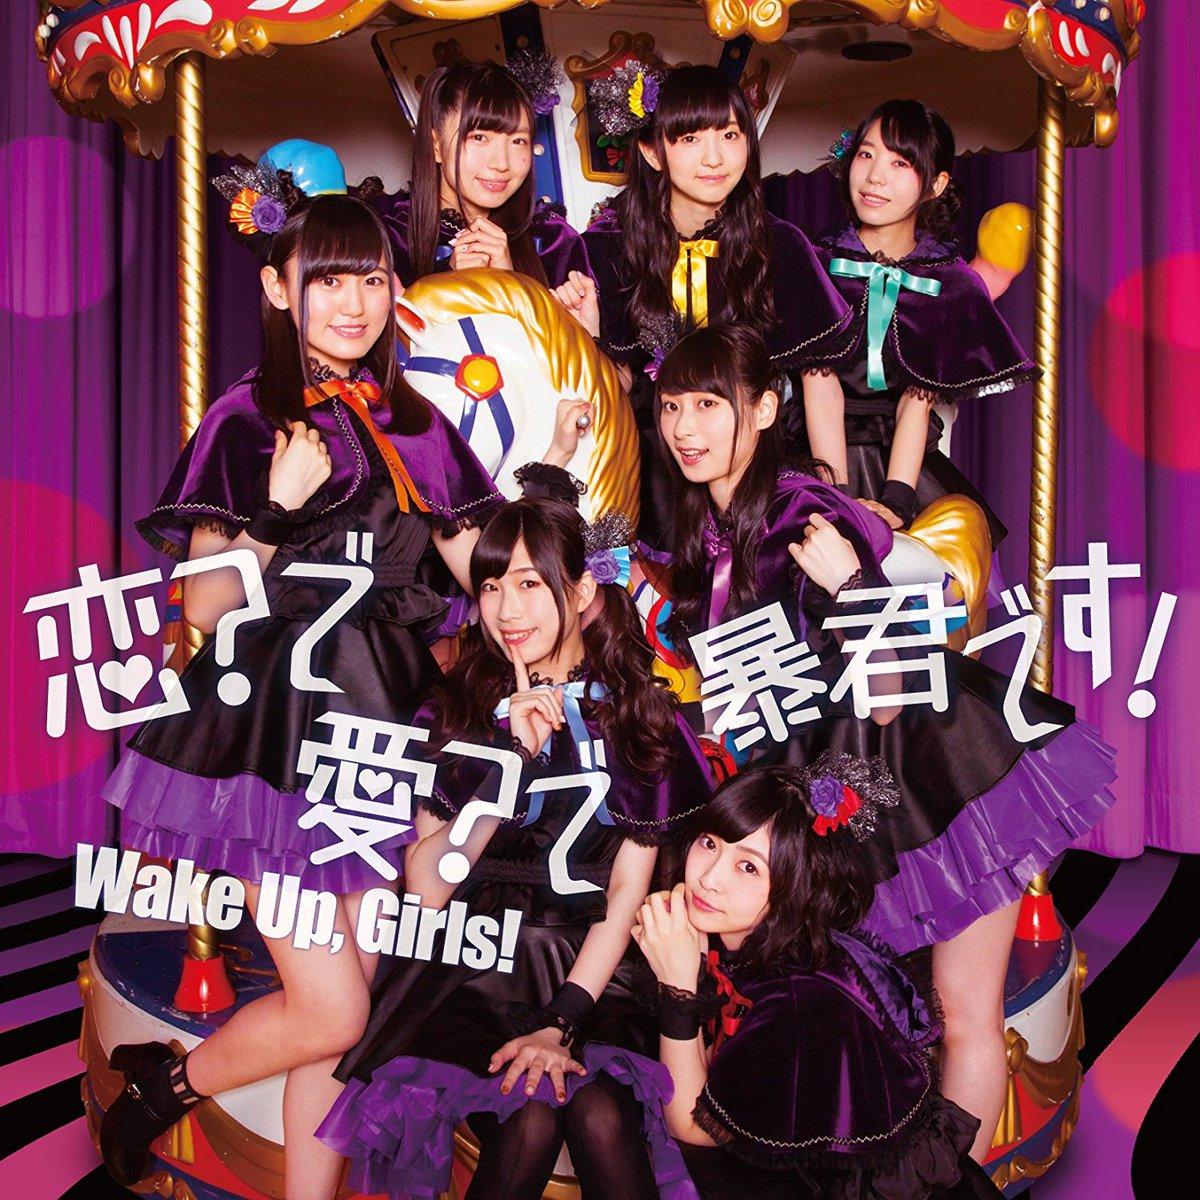 ◆CD入荷情報◆Wake Up,Girls !『恋で愛で暴君です!』【CD+DVD】【通常盤】共に本日入荷致しました!!